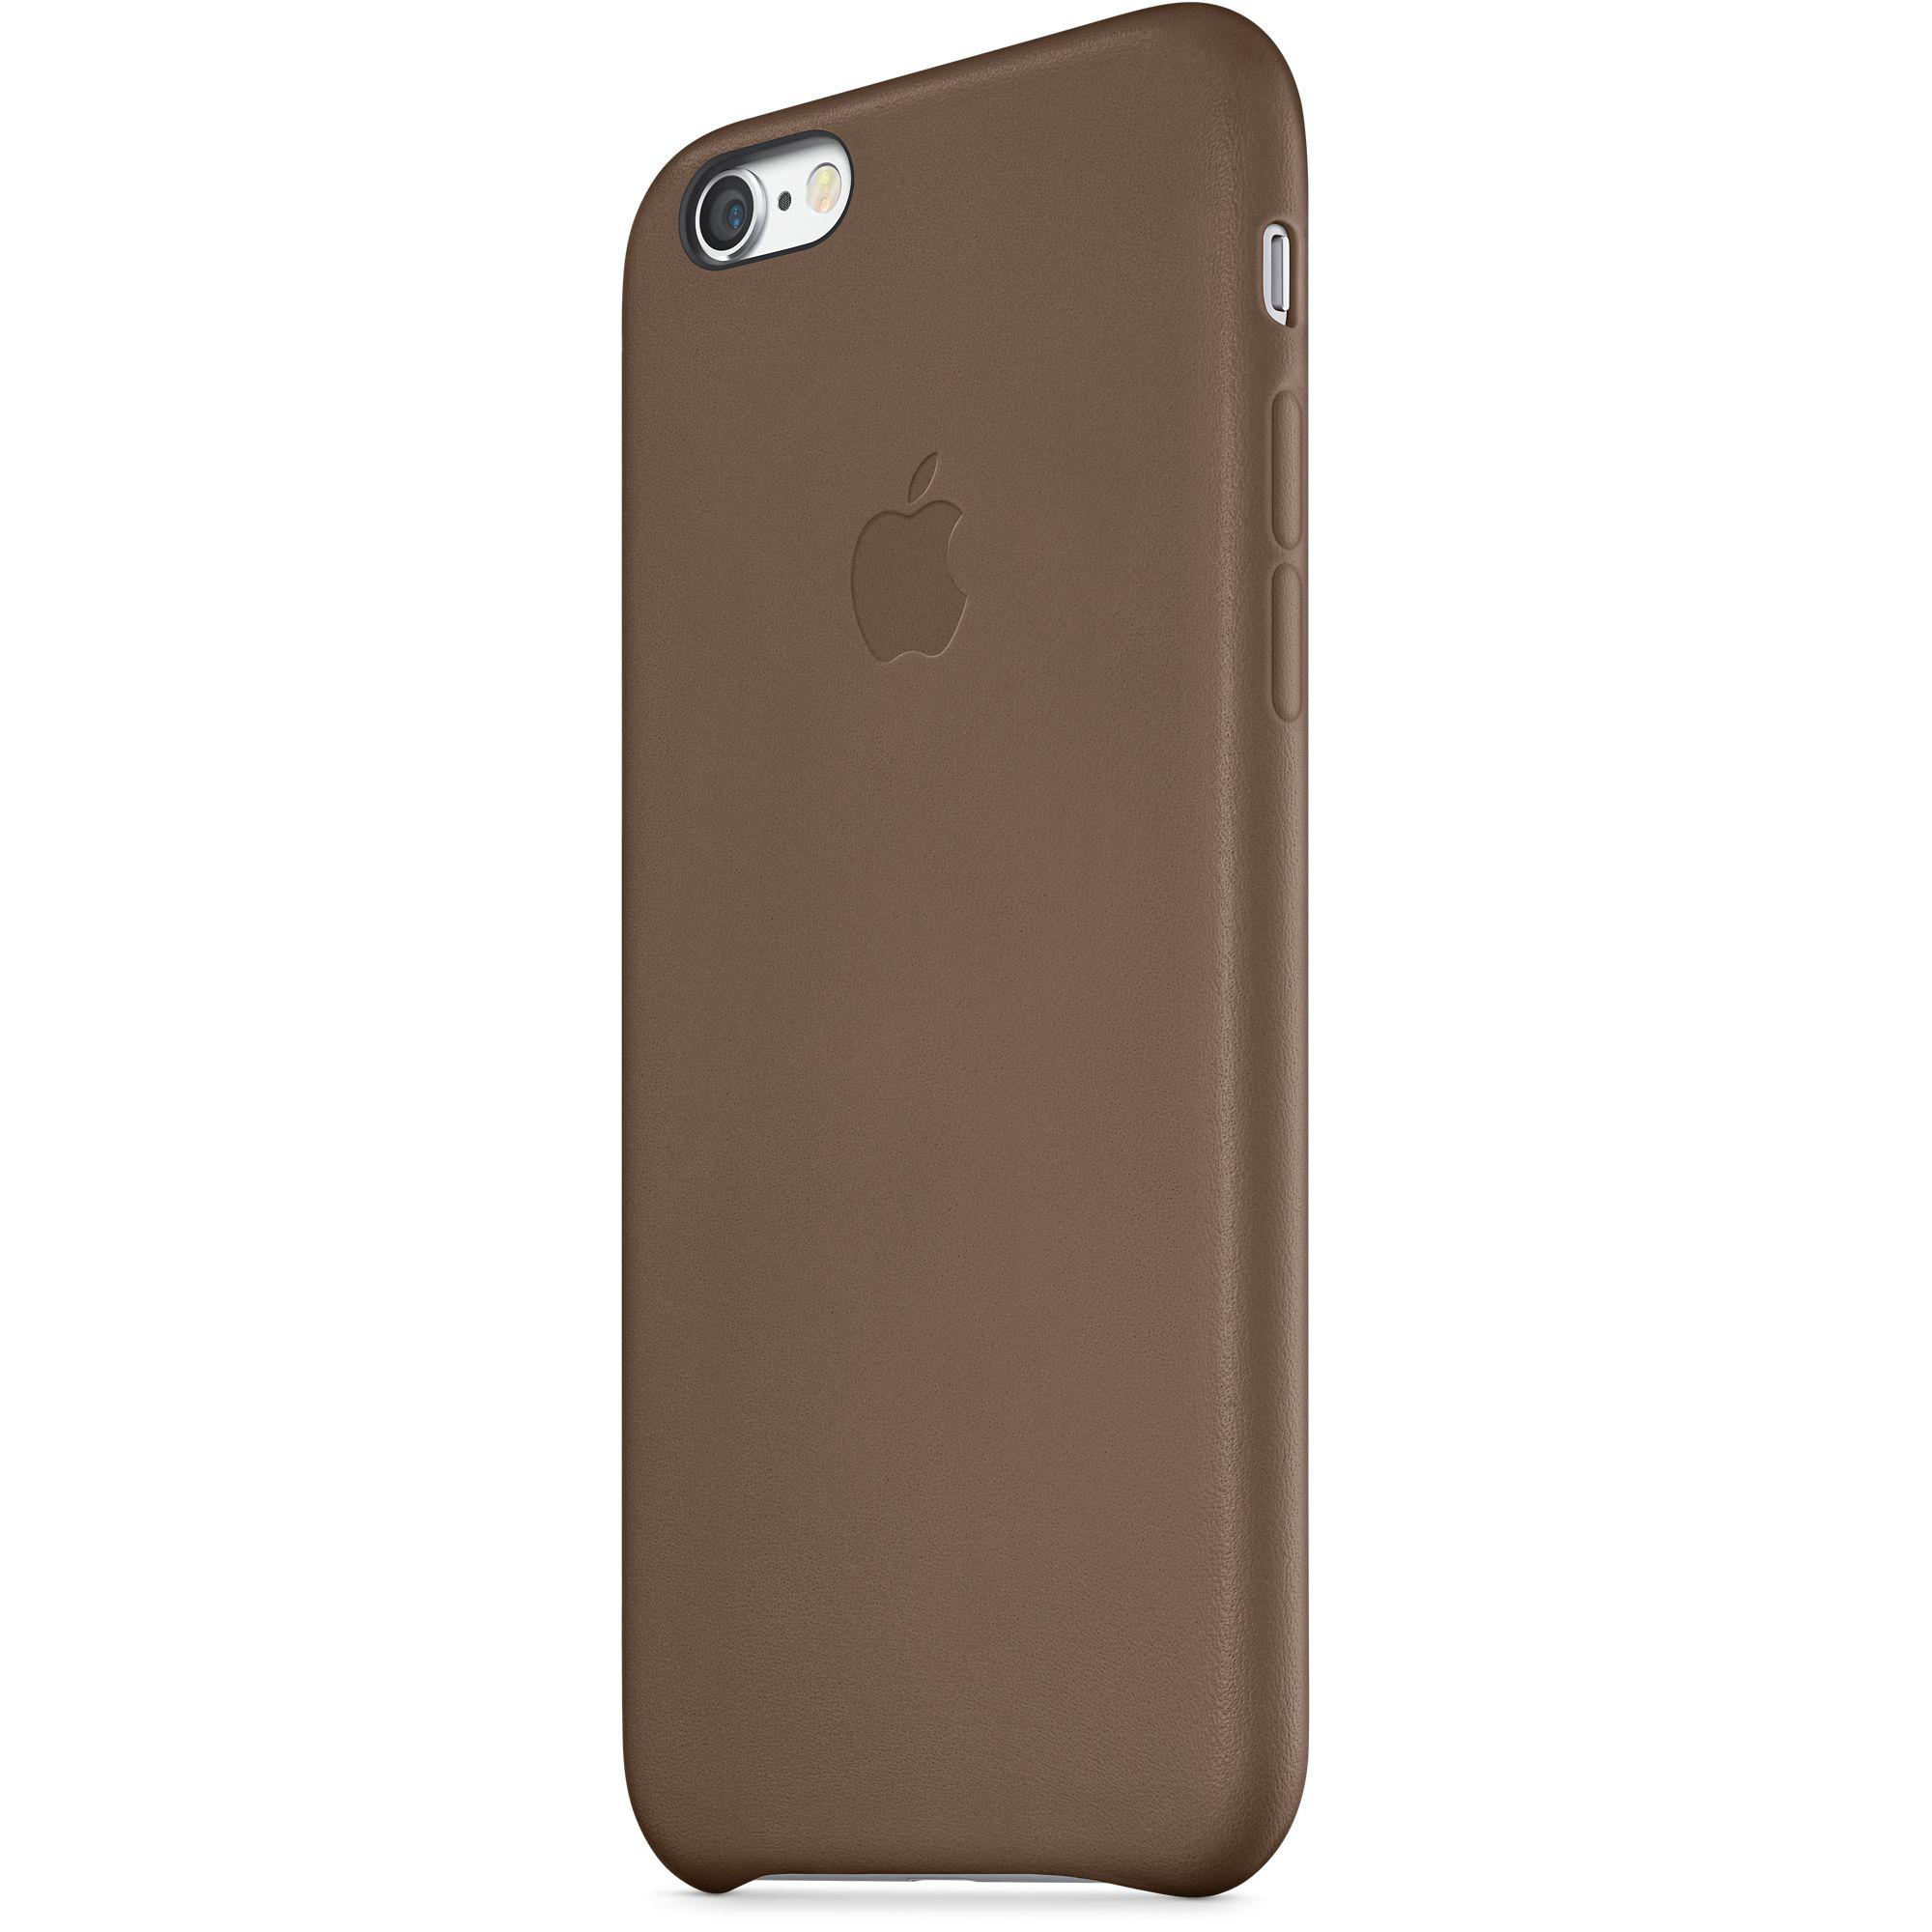 Apple-iPhone-6-Leather-Case-8.jpg